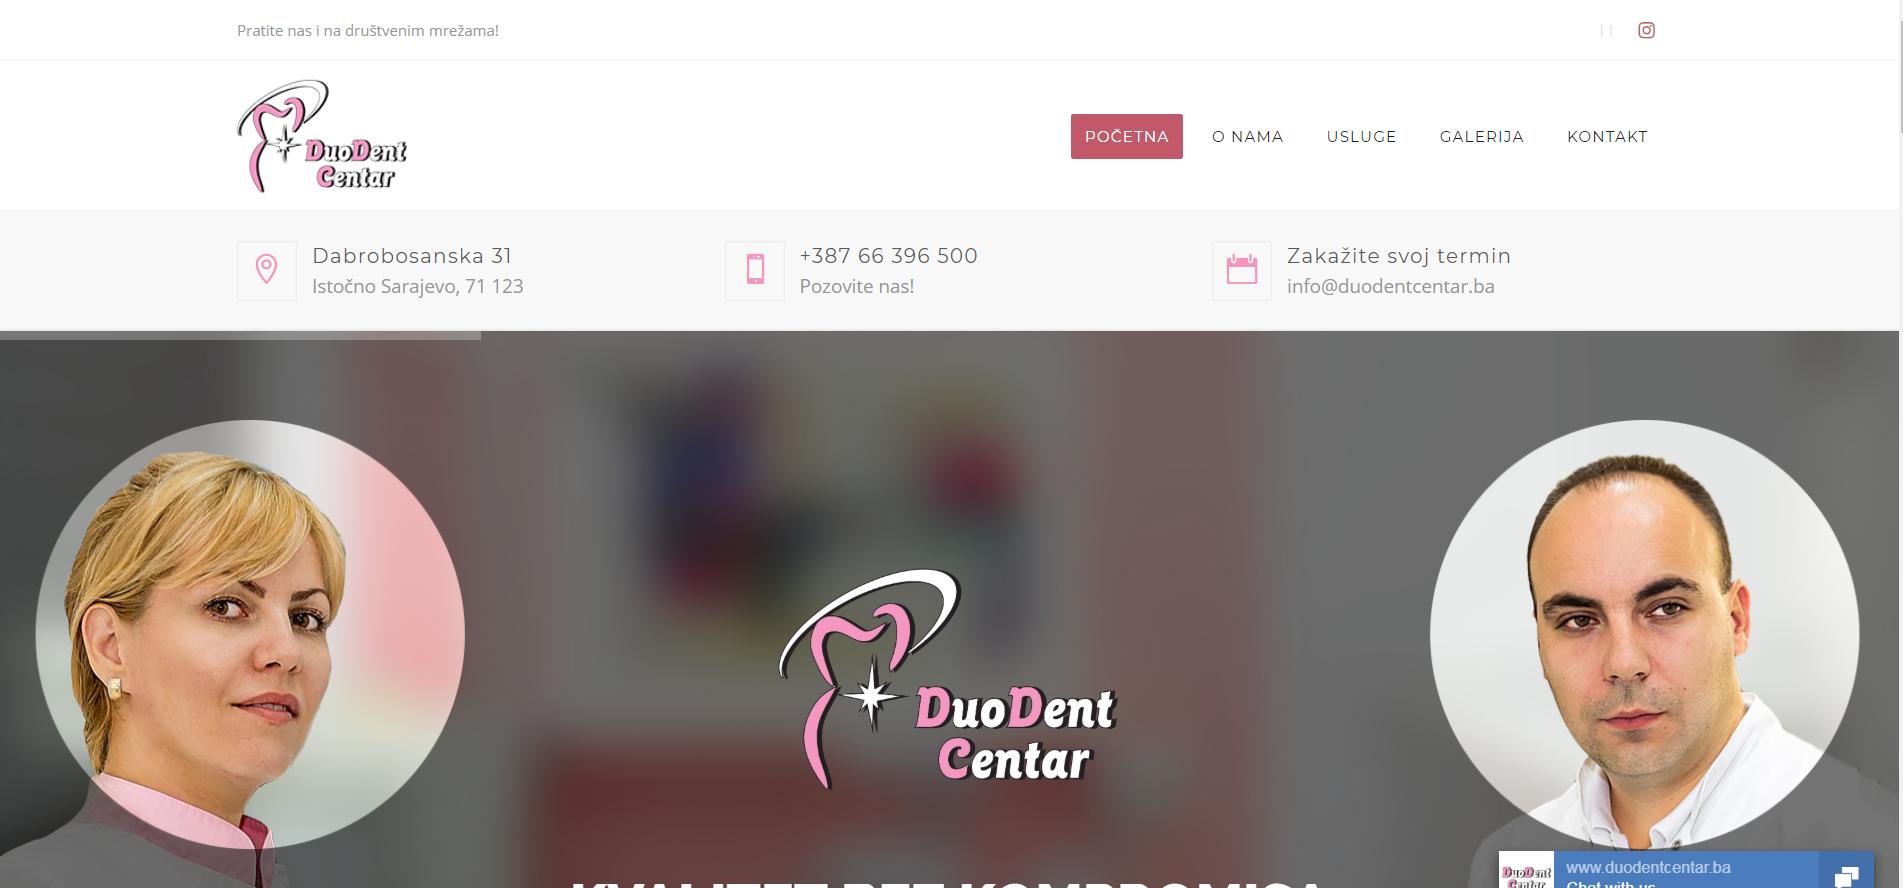 DuoDent Centar